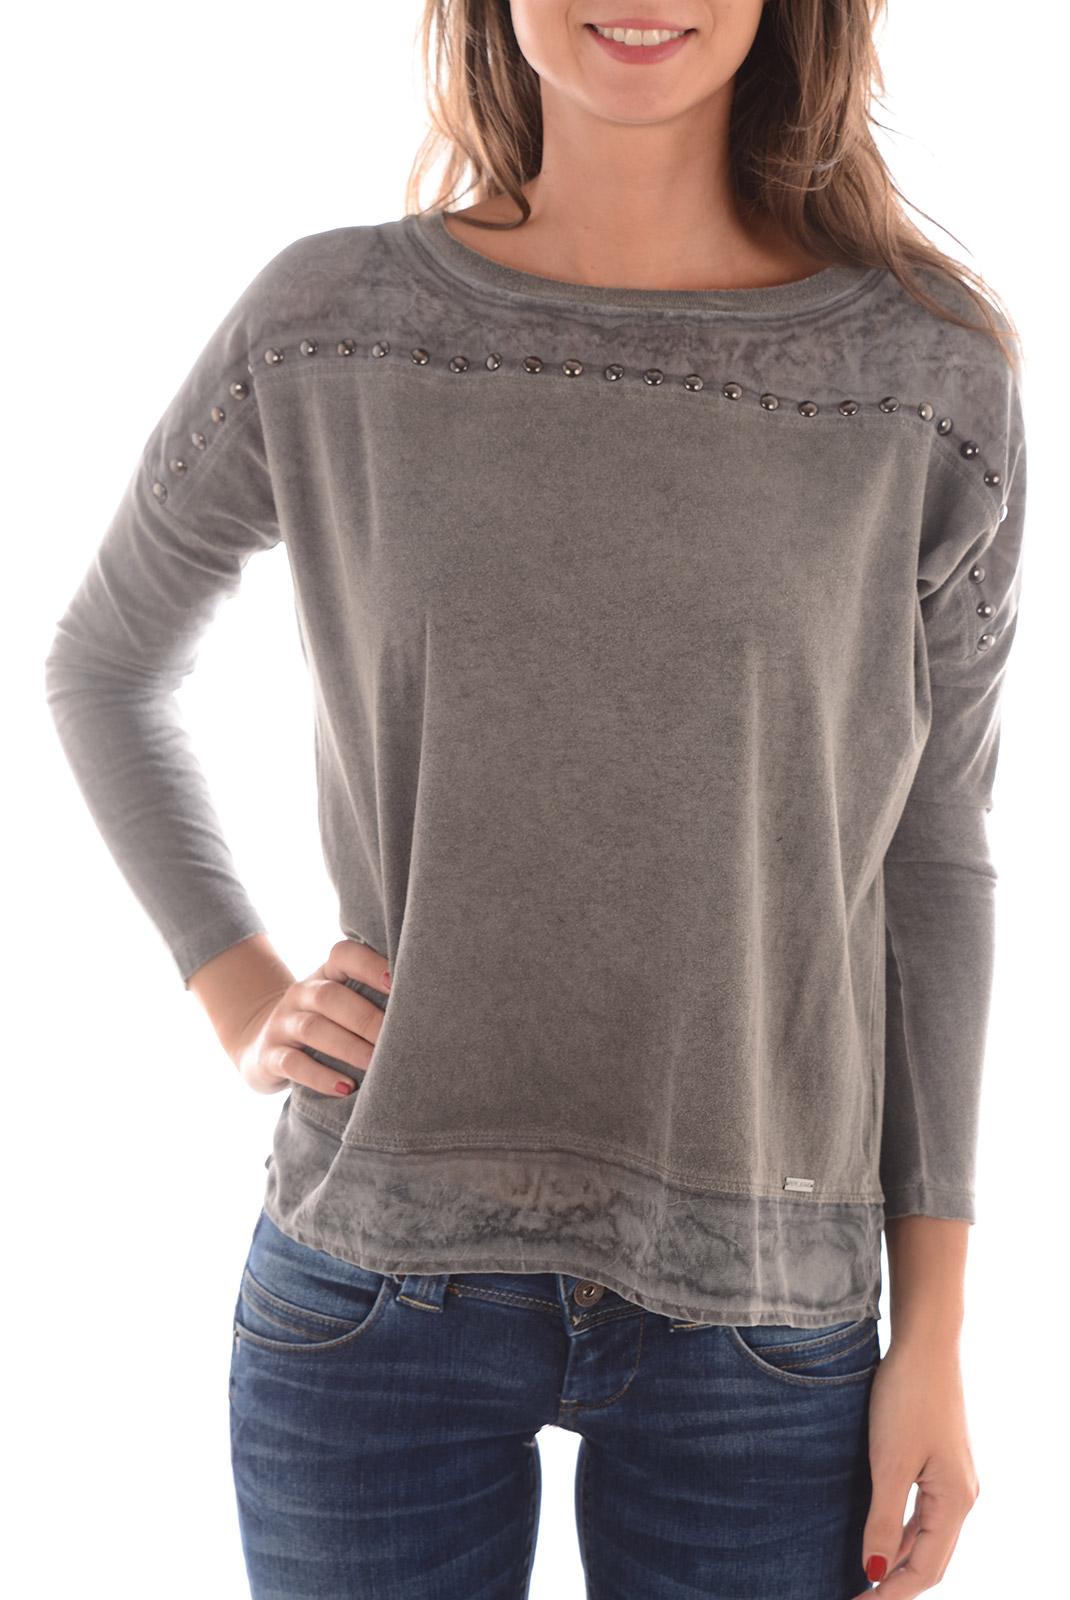 tee shirt manches longues femme pepe jeans pl501642 chestnut 975 dk grey. Black Bedroom Furniture Sets. Home Design Ideas